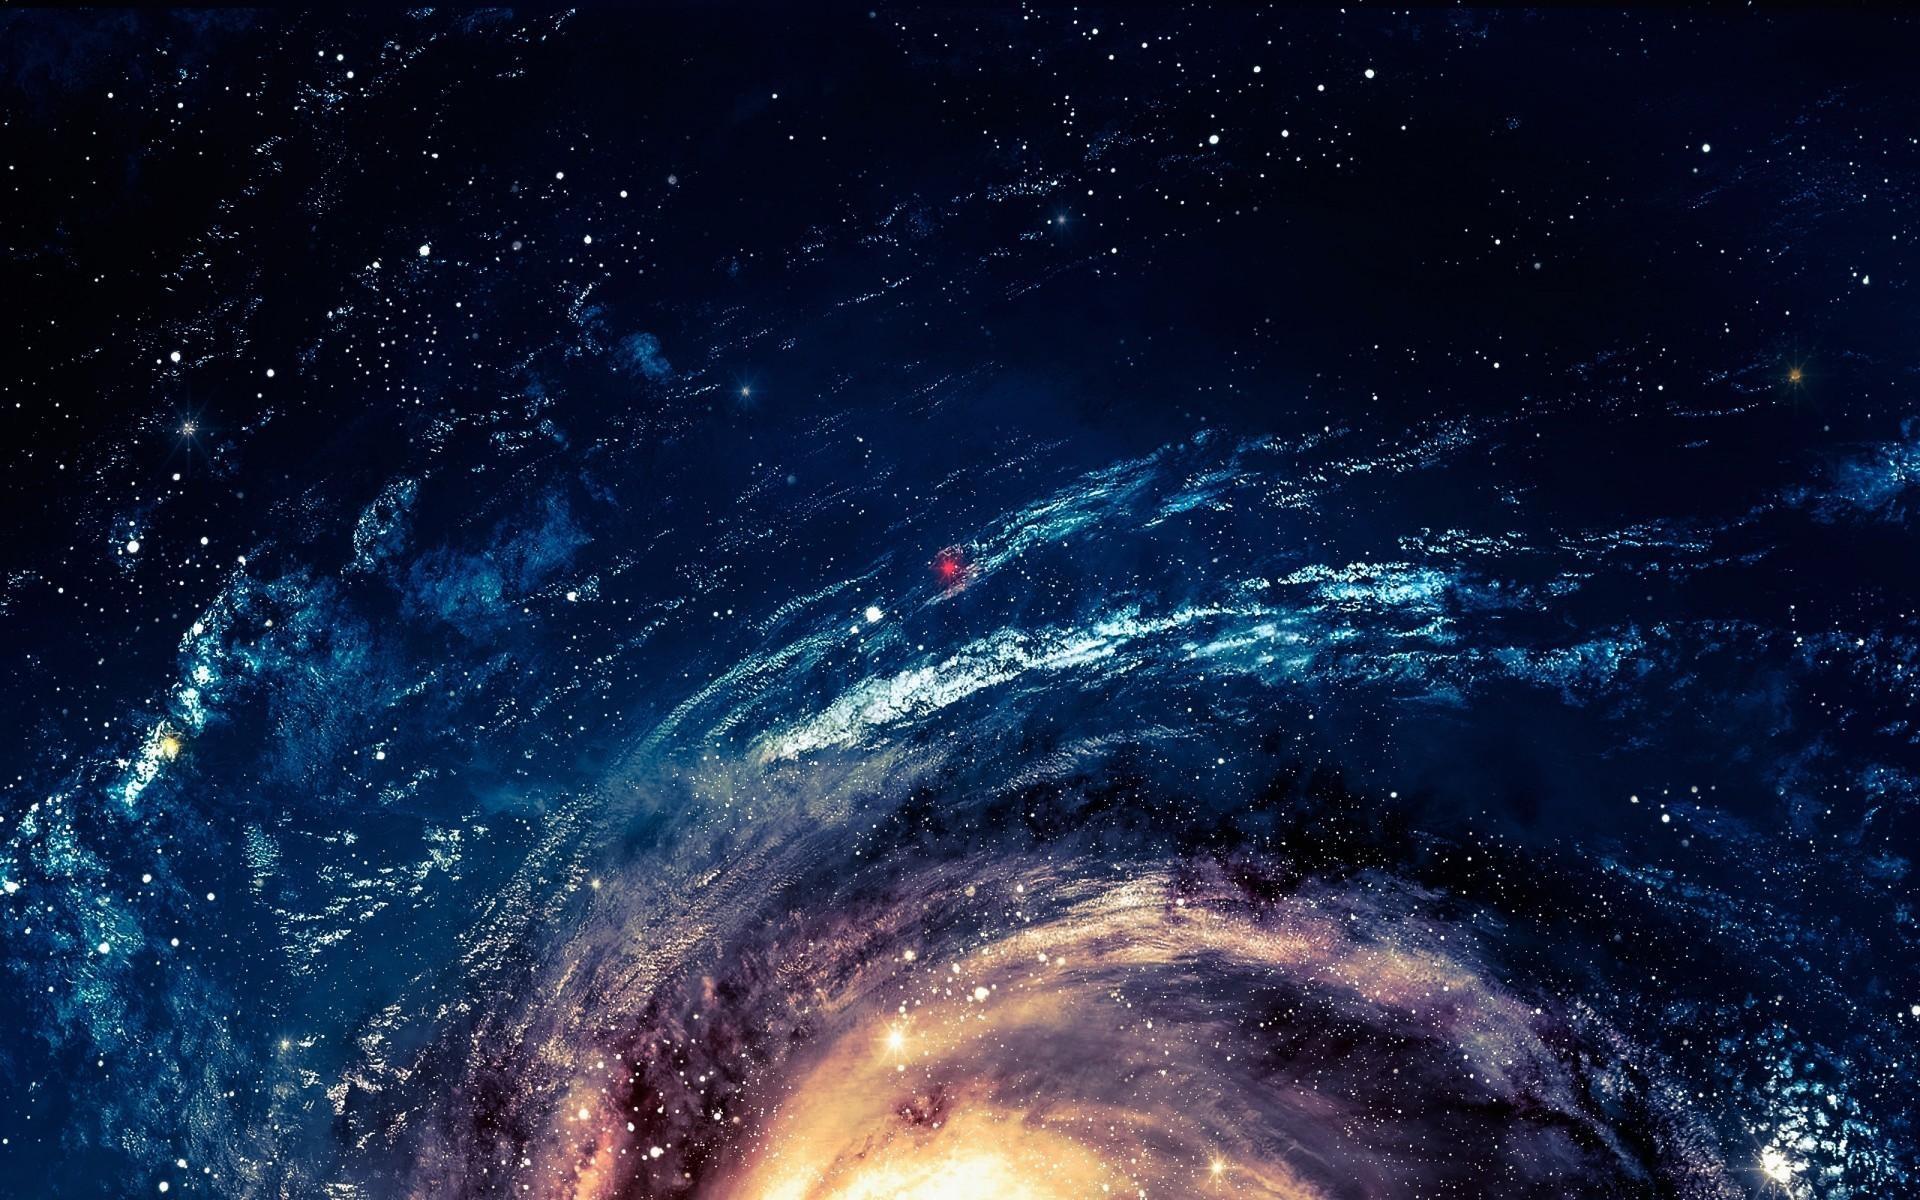 wallpaper.wiki-Beautiful-Space-Galaxy-Cosmos-Stars-Energy-